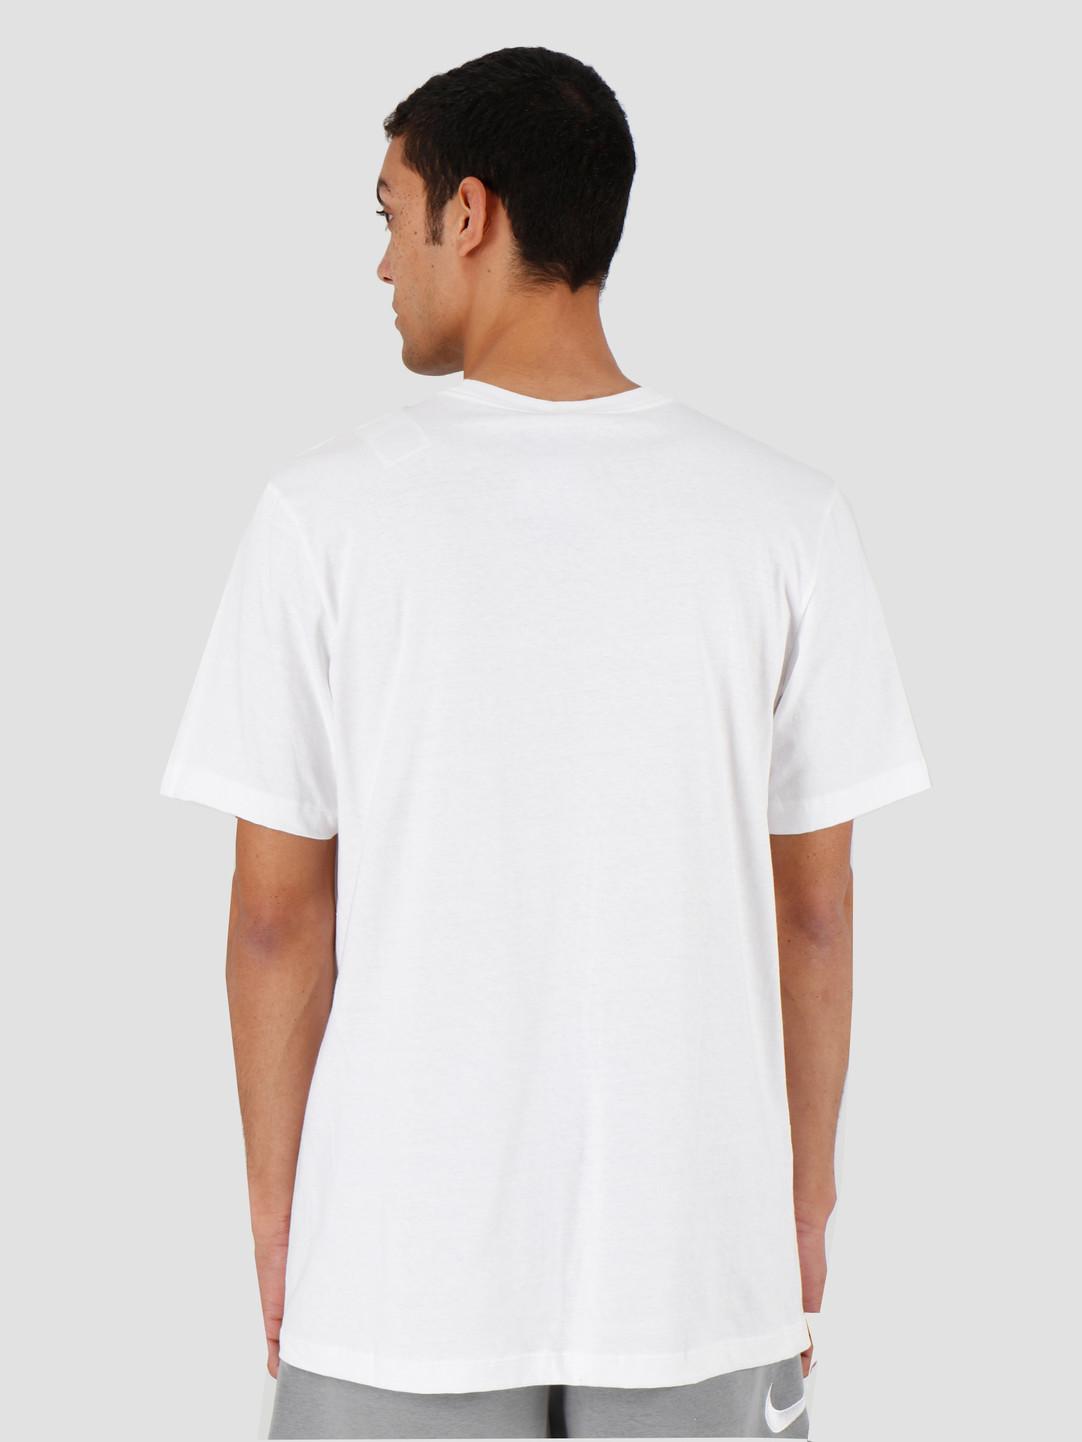 Nike Nike NSW T-shirt Snkr Cltr 9 White CK2672-100